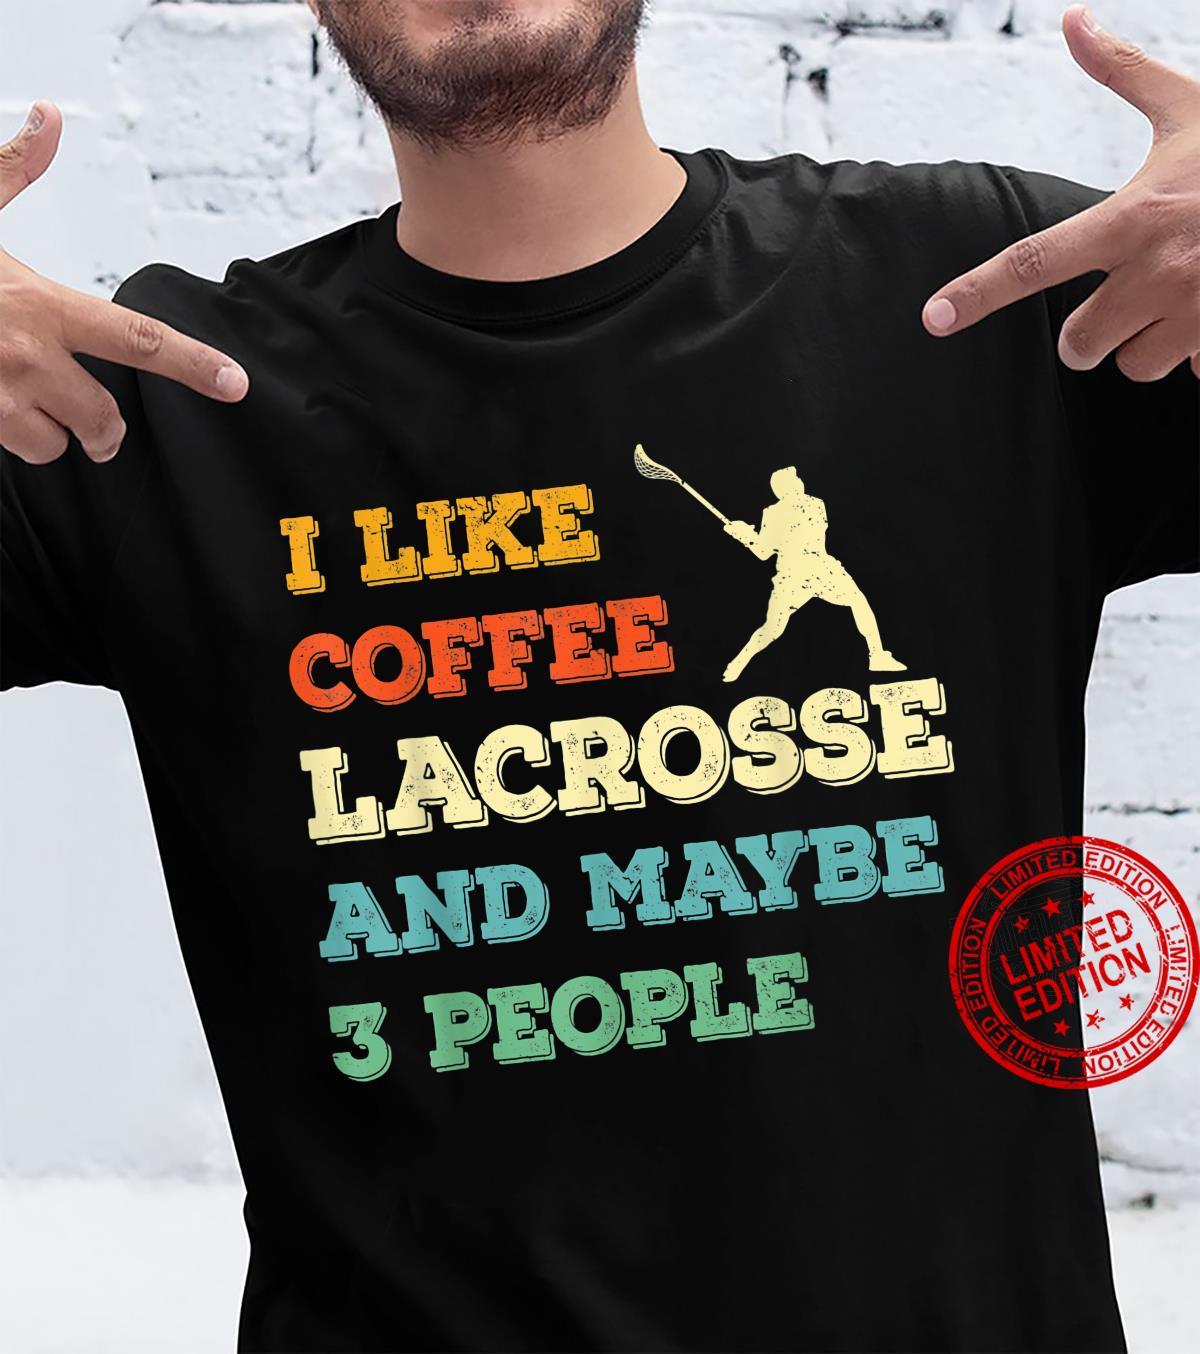 Lacrosse Sport Fan or Player Coffee retro theme Shirt